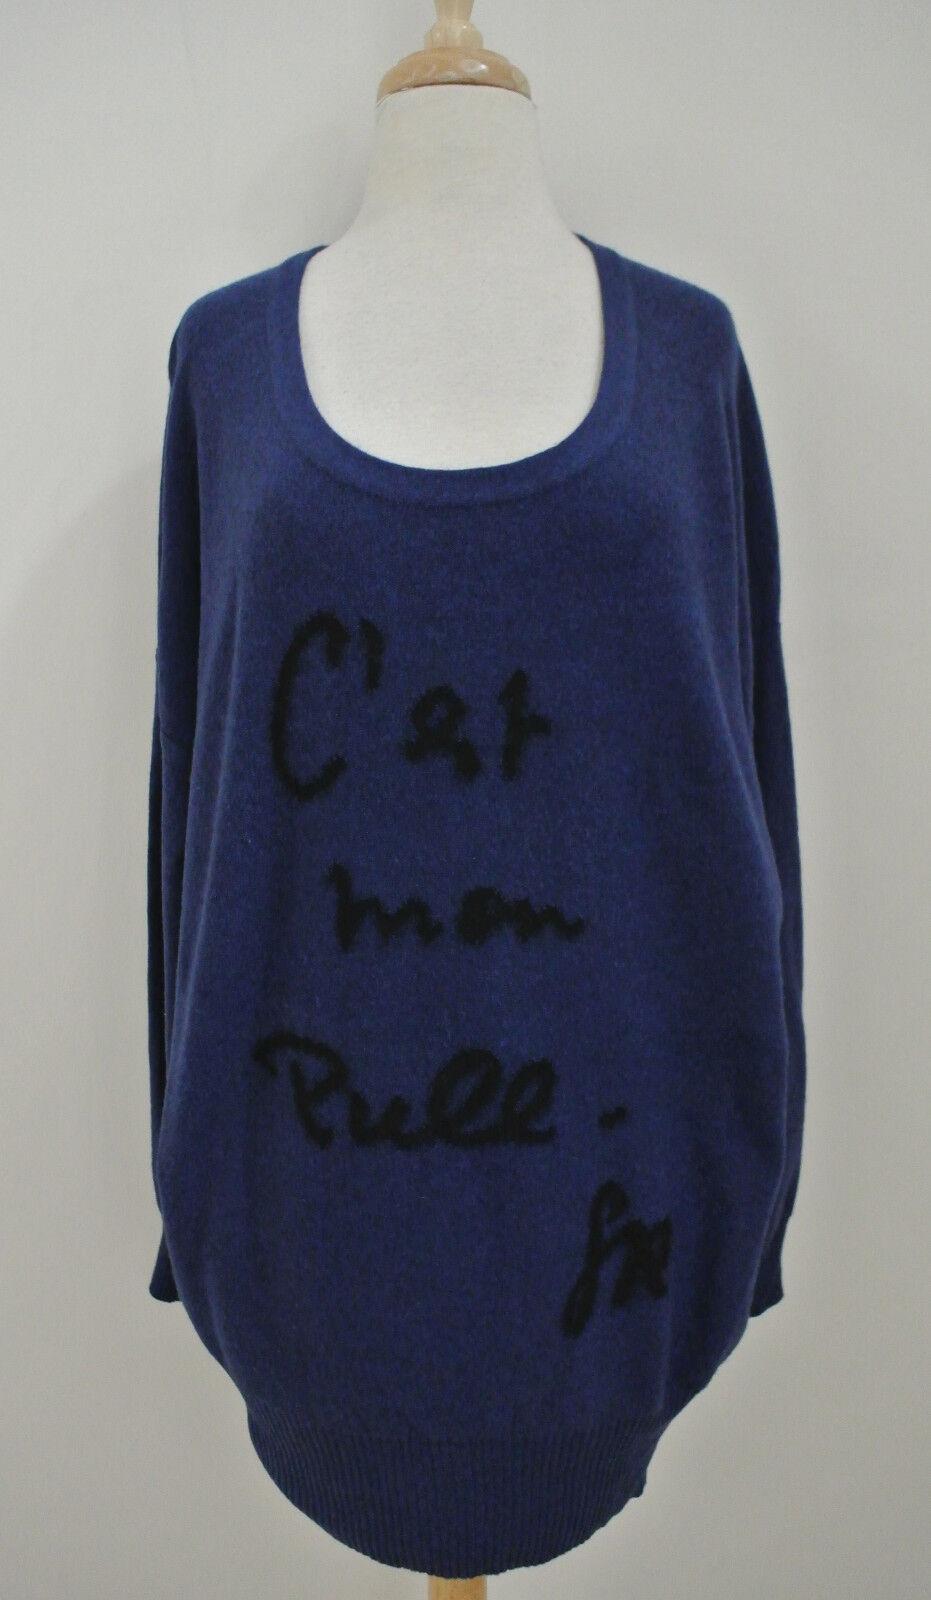 SONIA RYKIEL C'est Ma Pull Intarsia sweater L wool cashmere cashmere cashmere bluee tunic 222f8b